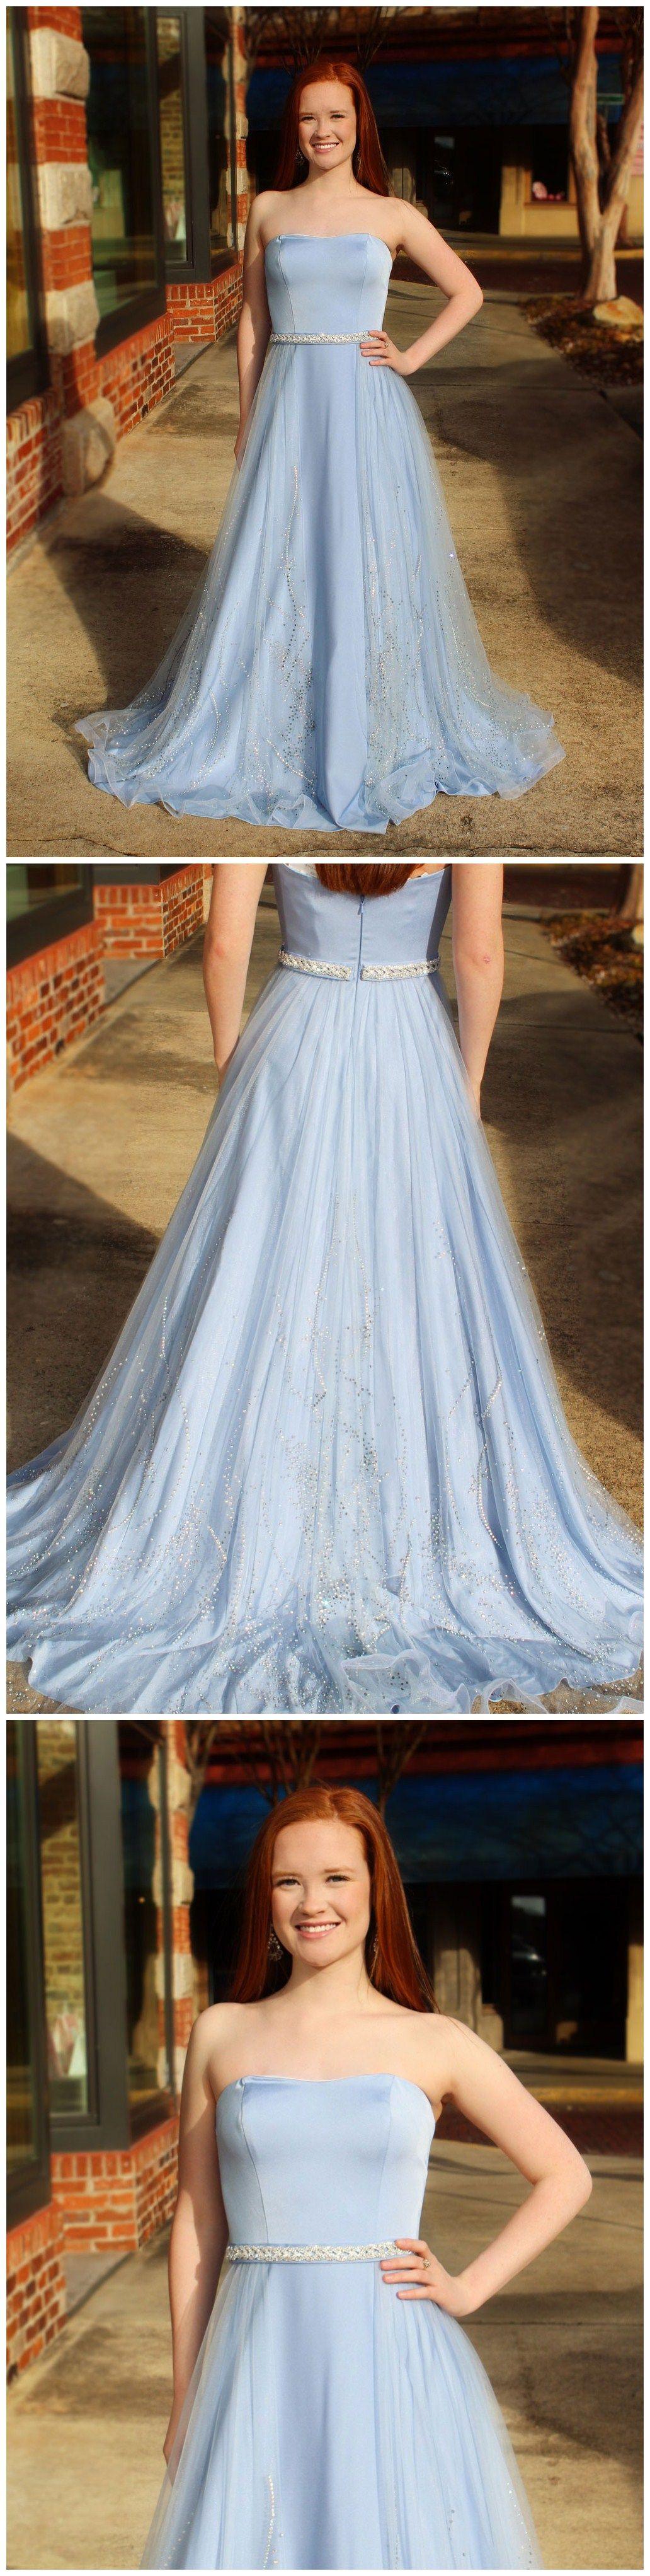 Strapless bra for wedding dress plus size  Elegant Satin Strapless Neckline Aline Prom Dresses With Beadings